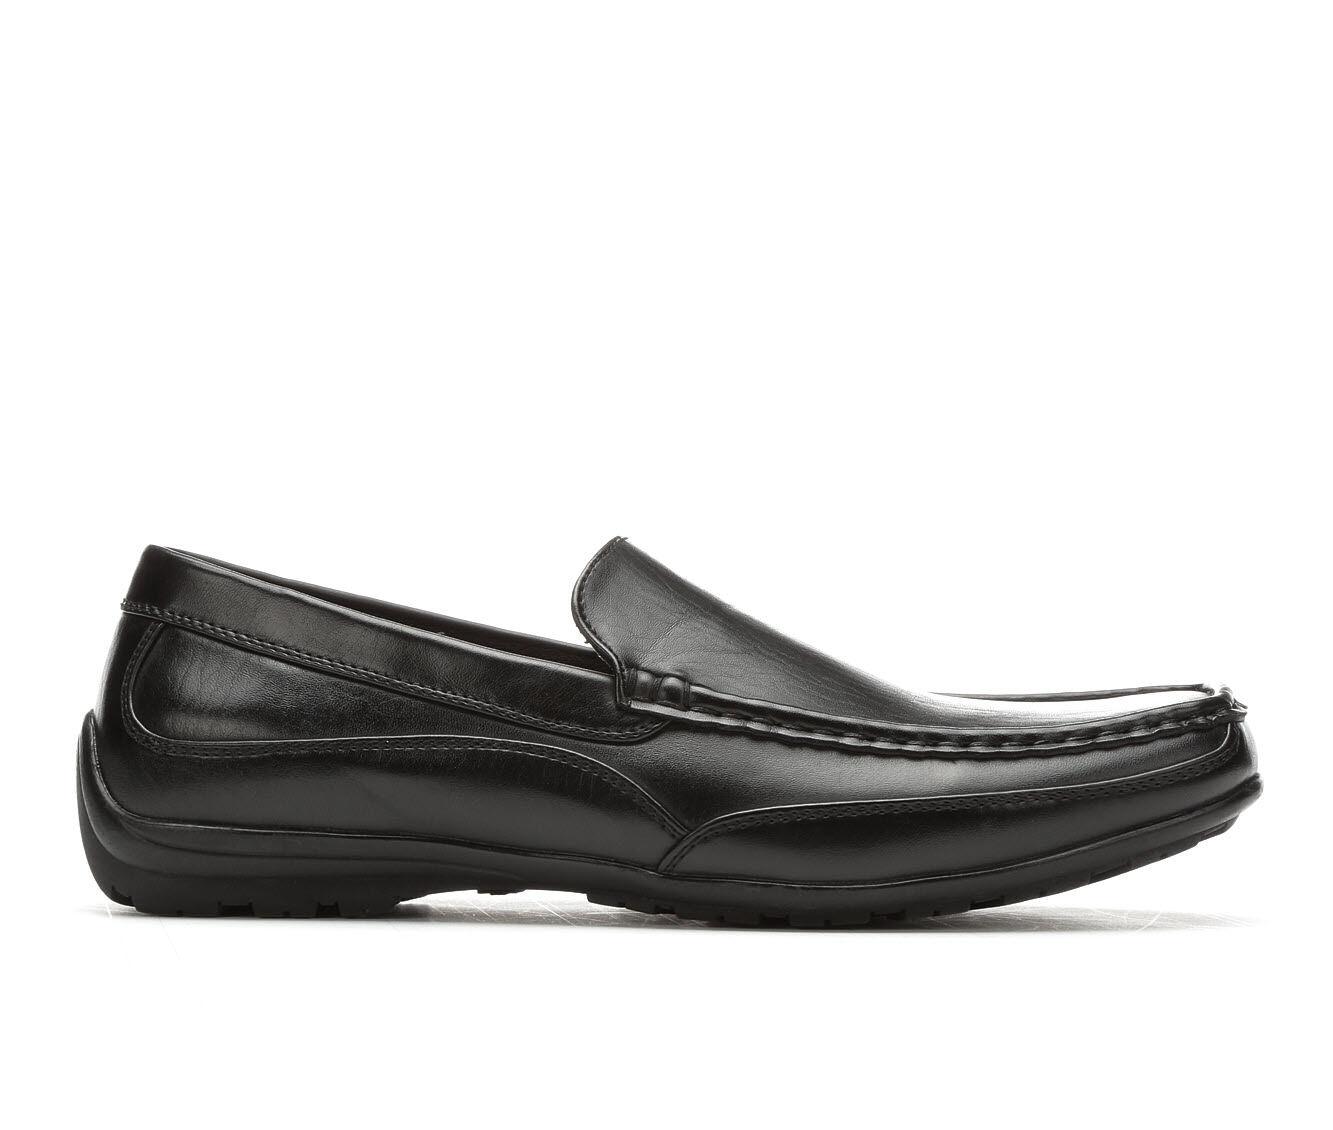 Men's Deer Stags Drive Loafers Black